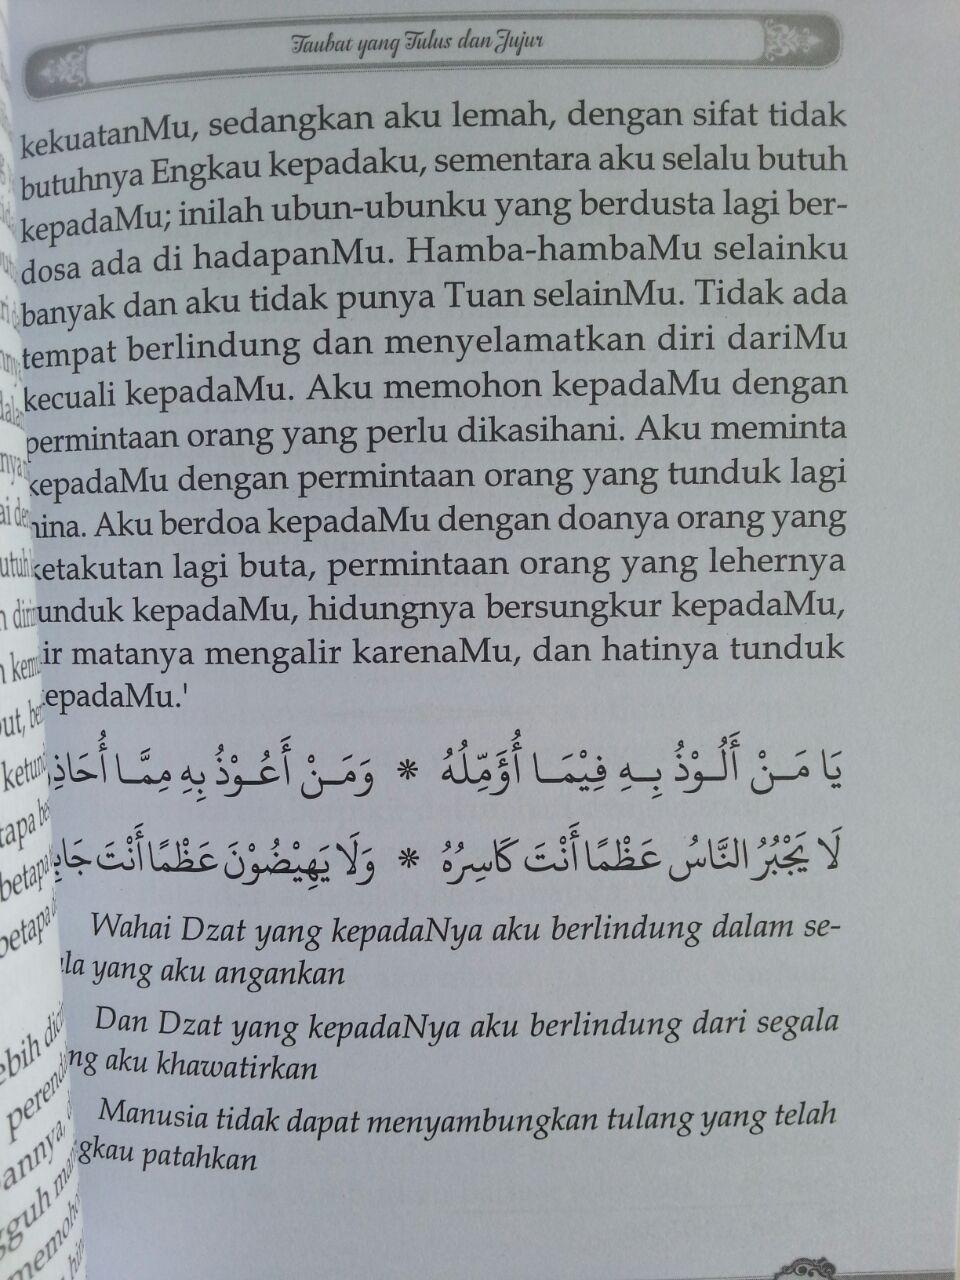 Buku Kiat-Kiat Hijrah Dari Kemaksiatan Kemudian Istiqomah Dalam Ketaatan isi 3